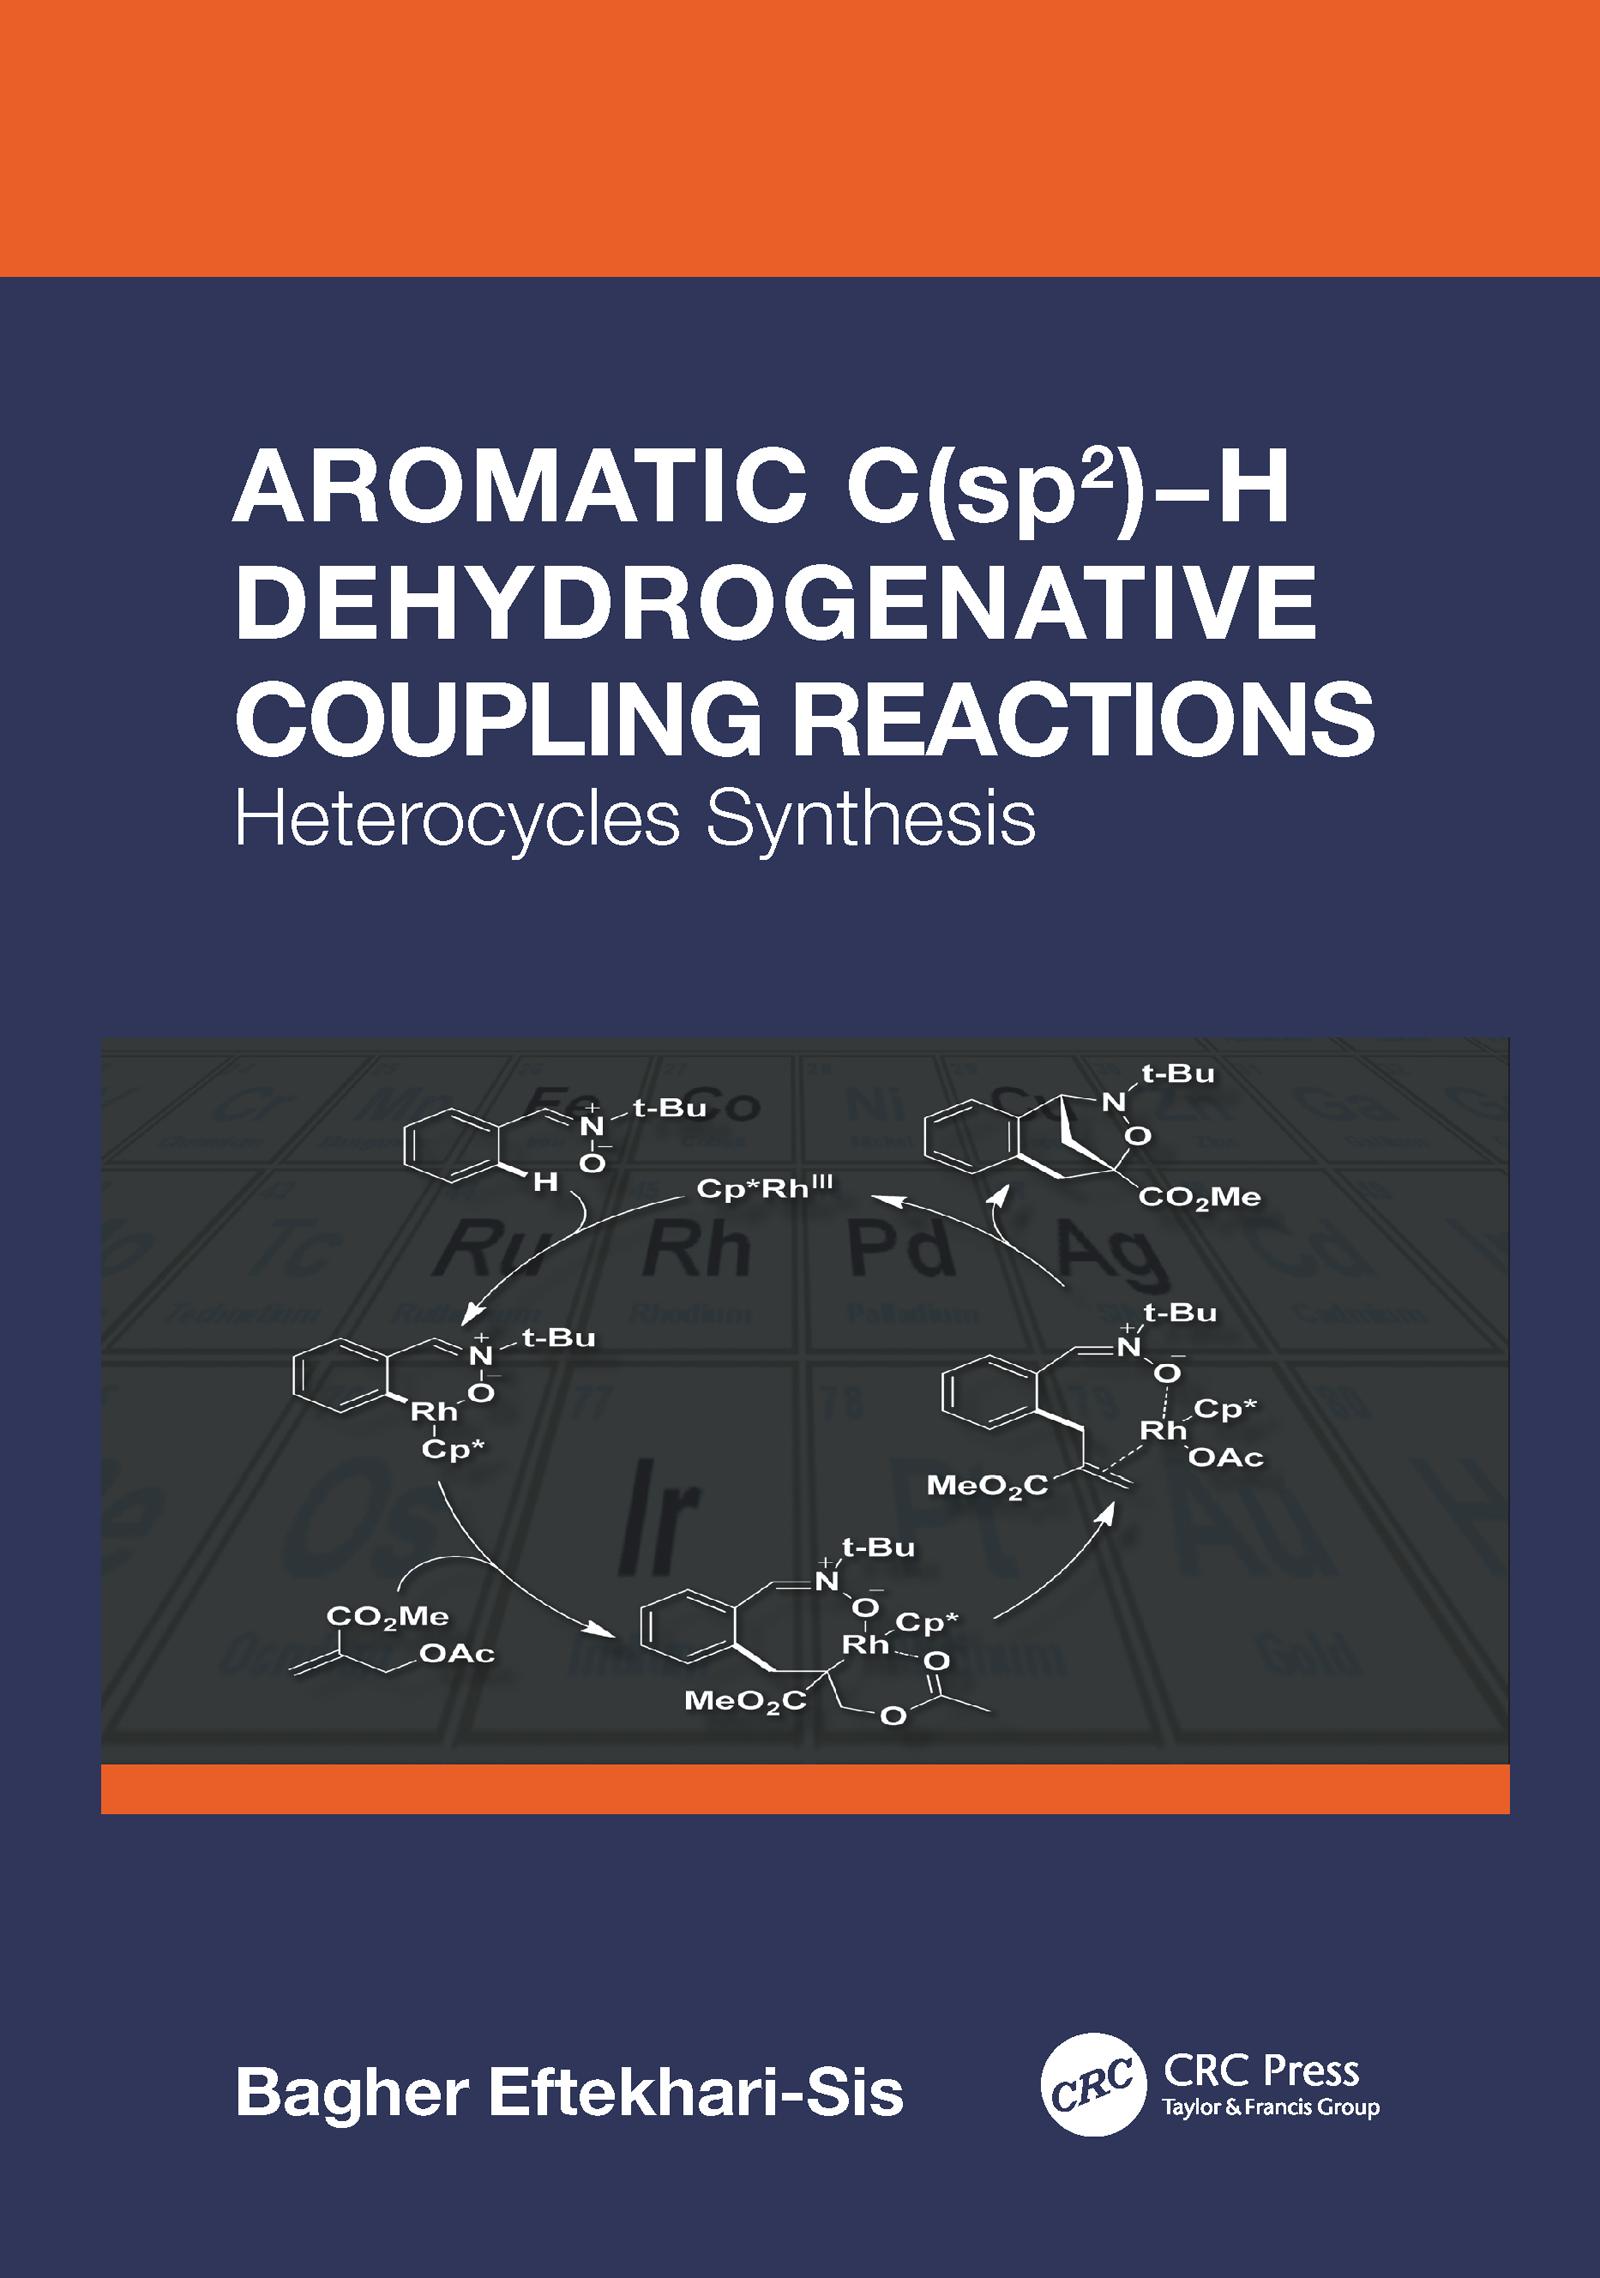 Aromatic C(sp2)−H Dehydrogenative Coupling Reactions